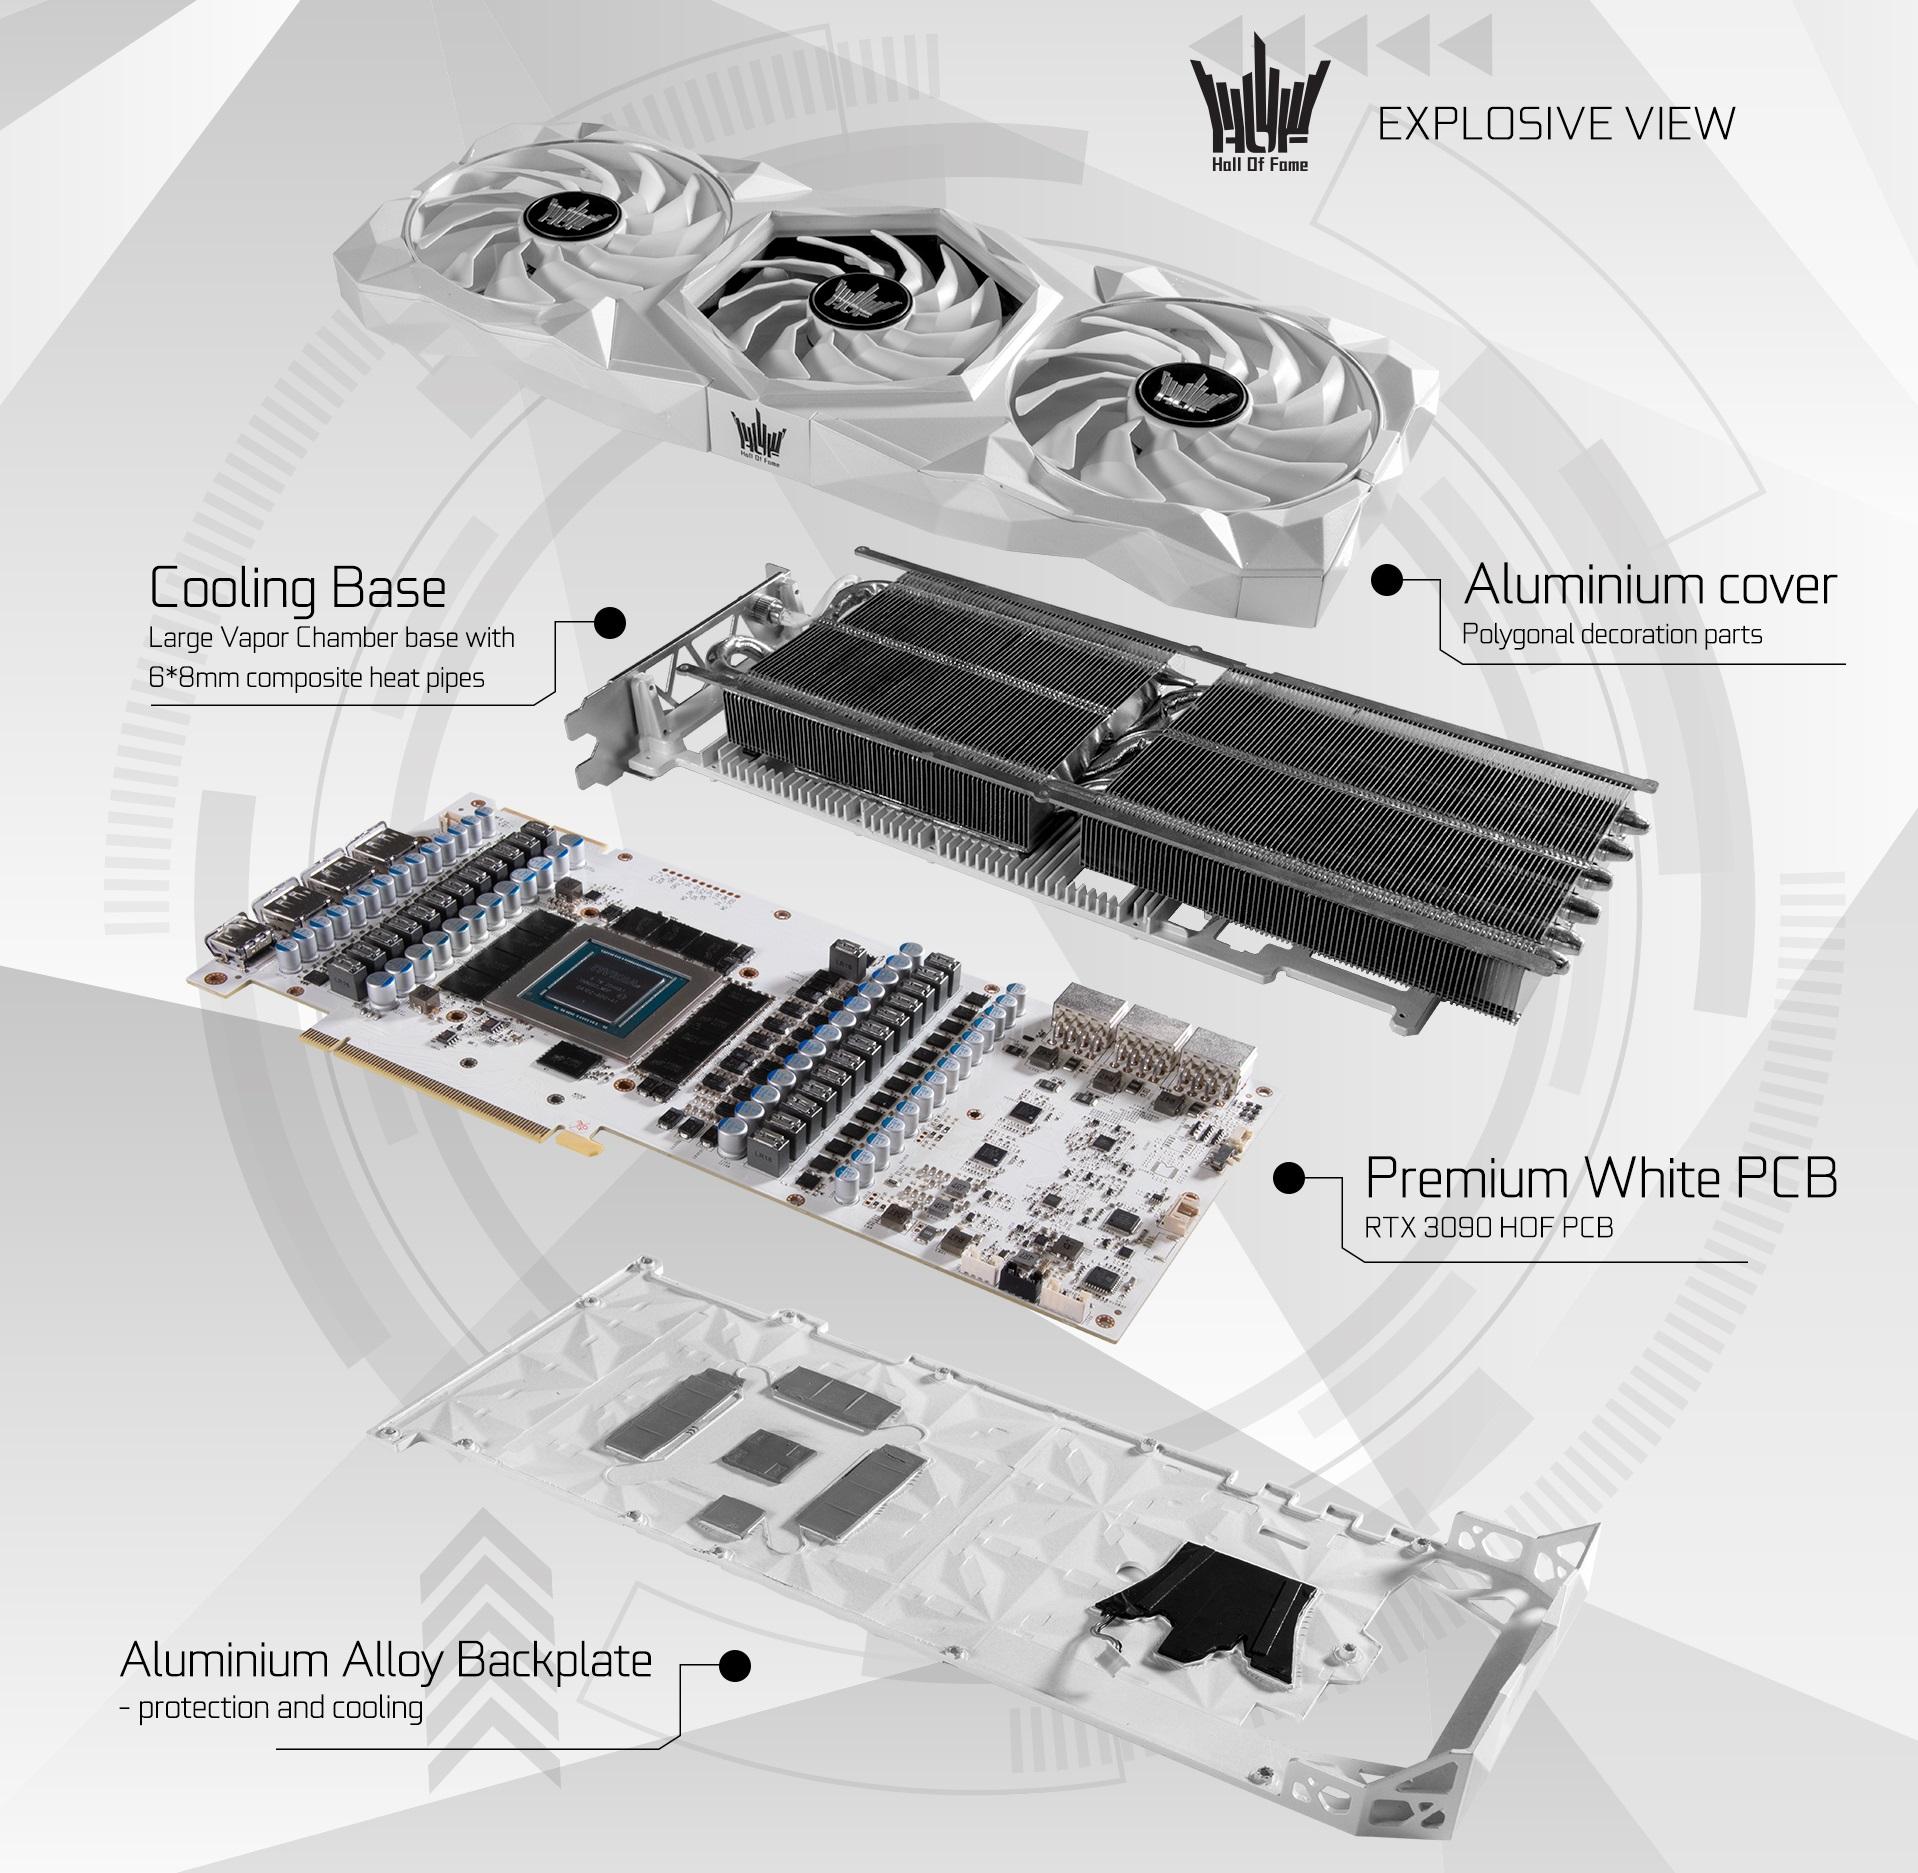 GALAX GeForce RTX 3090 Hall of Fame Premium 3 3